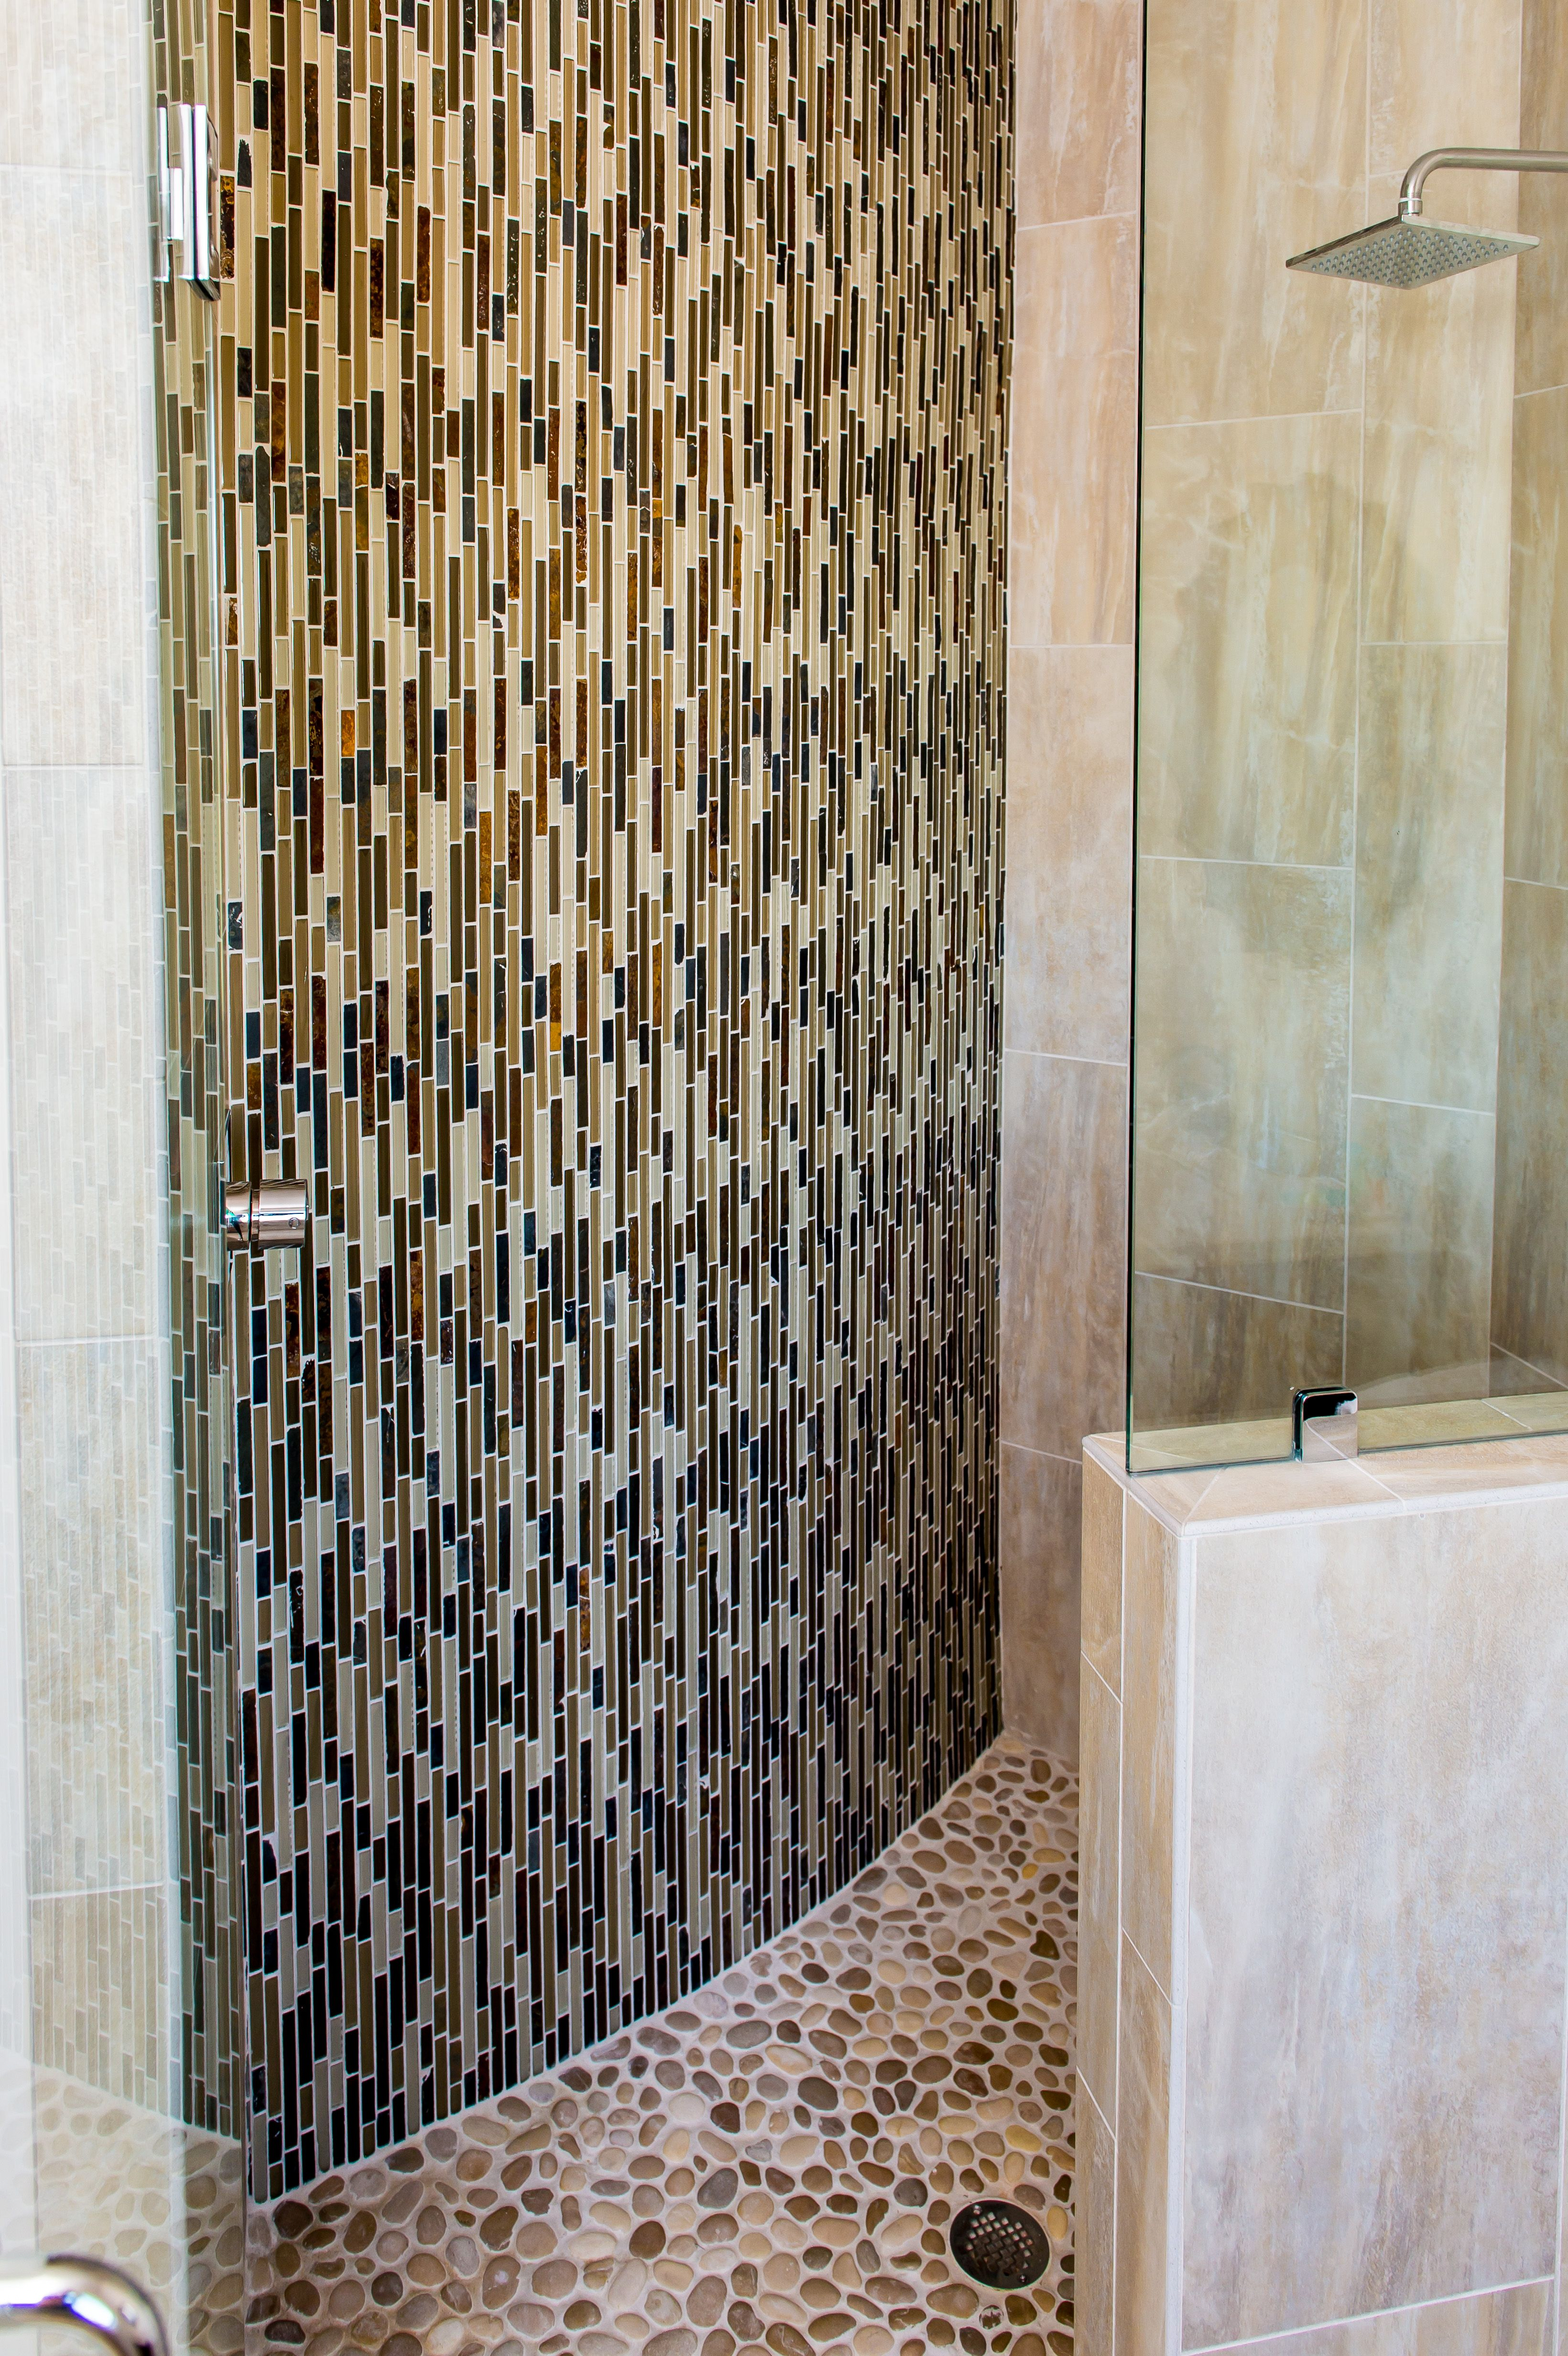 Love This Walk In Zero Entry Shower Looks Like It Belongs In An Over Water Bungalow In Bali Pebblestone Floor Granite Tile Glass Mosaic Tiles Mosaic Glass Decorative glass tiles bathroom